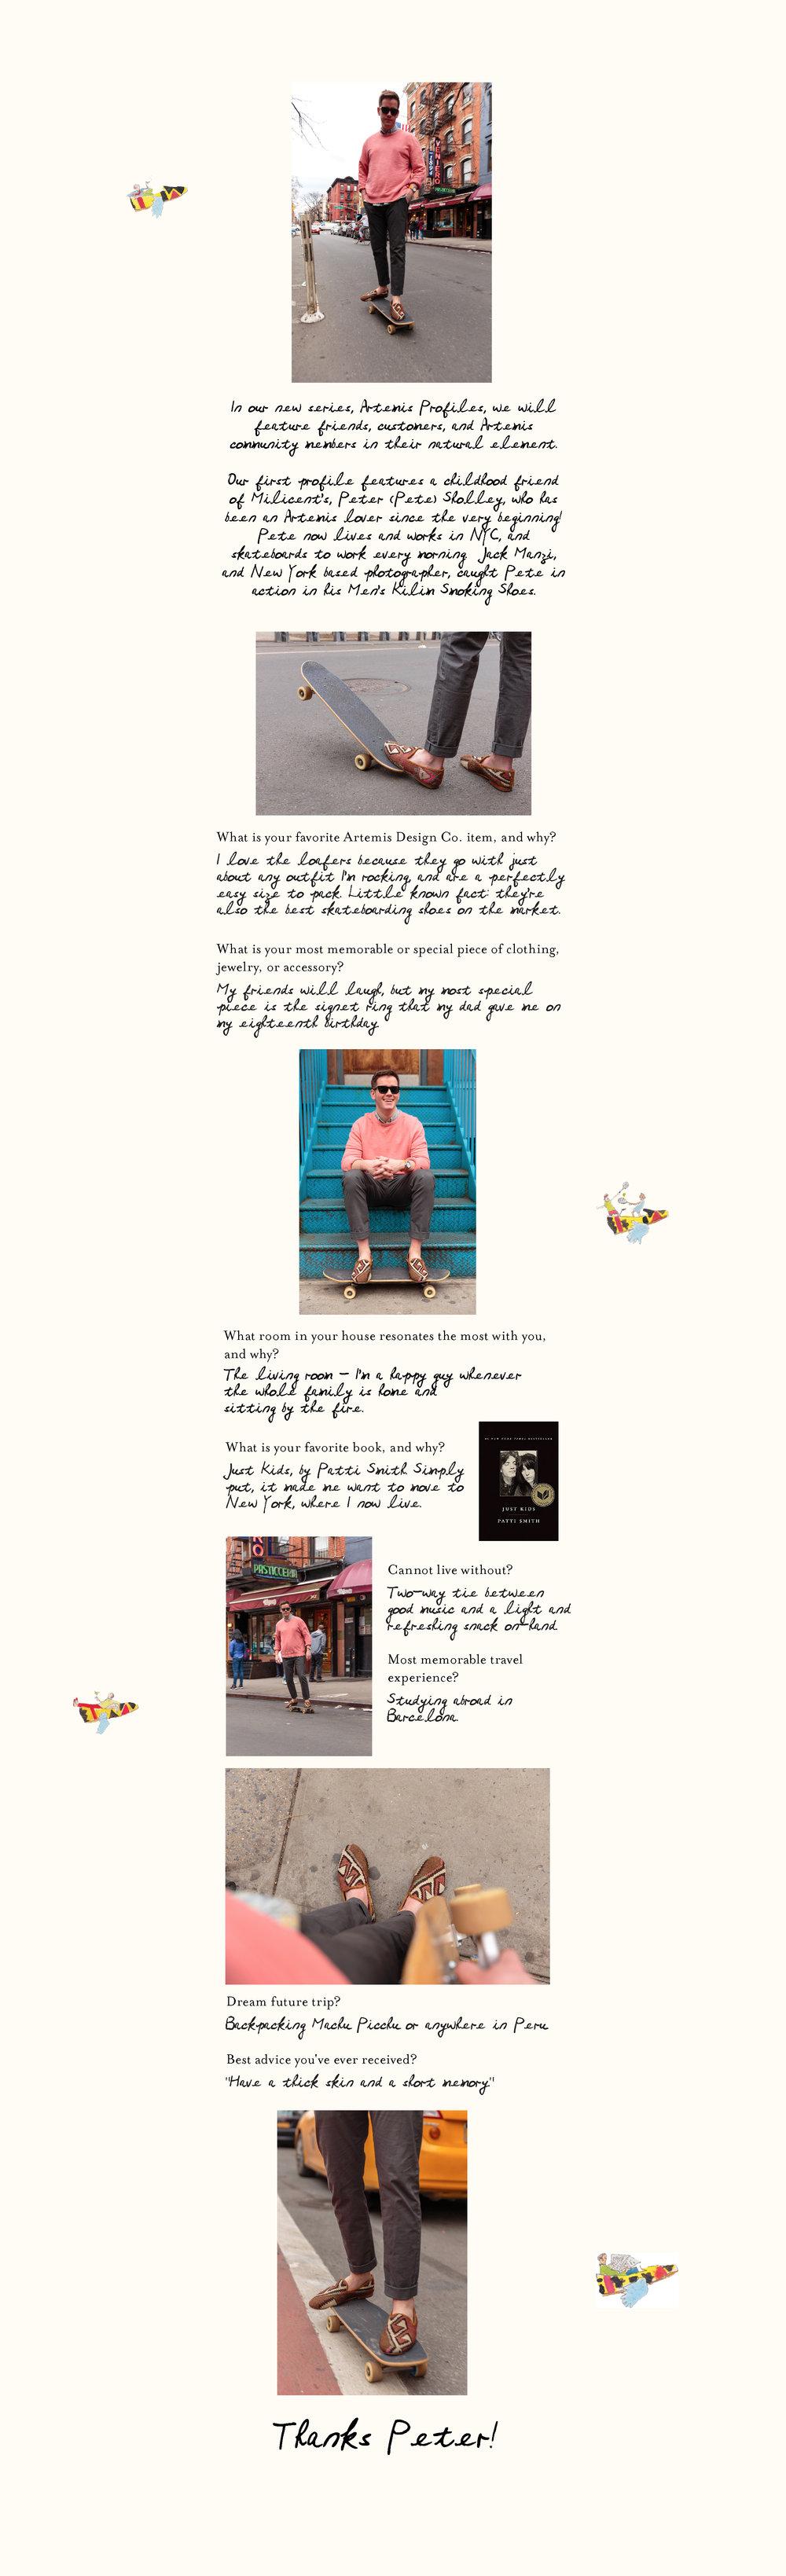 peter sholley in men's kilim smoking shoes.jpg